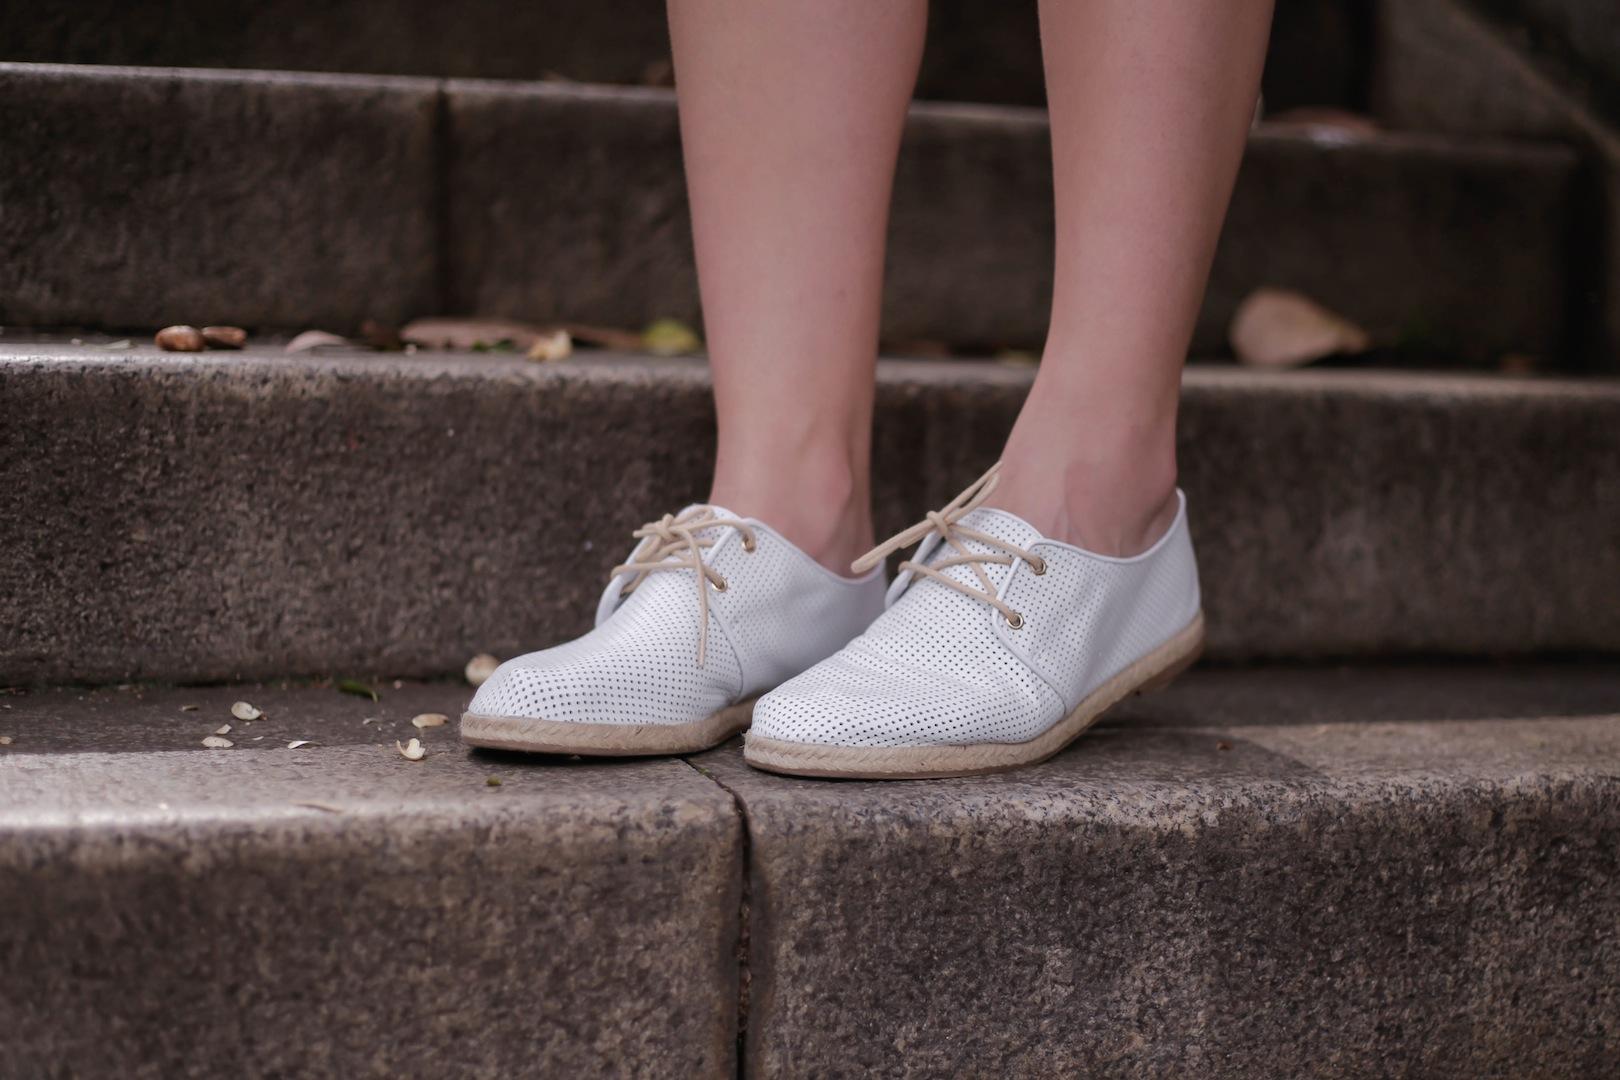 aea054c95da Look do dia  shots estampado + tênis branco - Niina Secrets